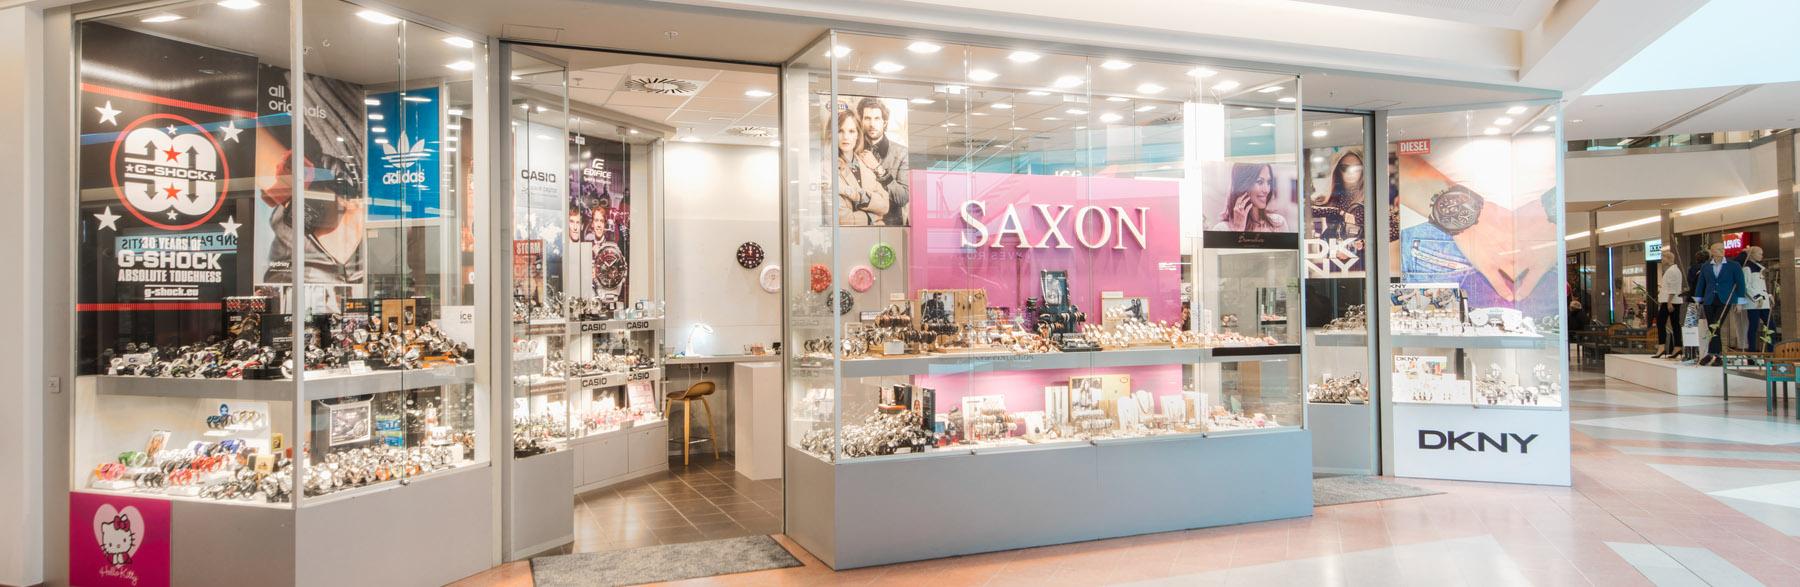 Saxon juwelen en horloges